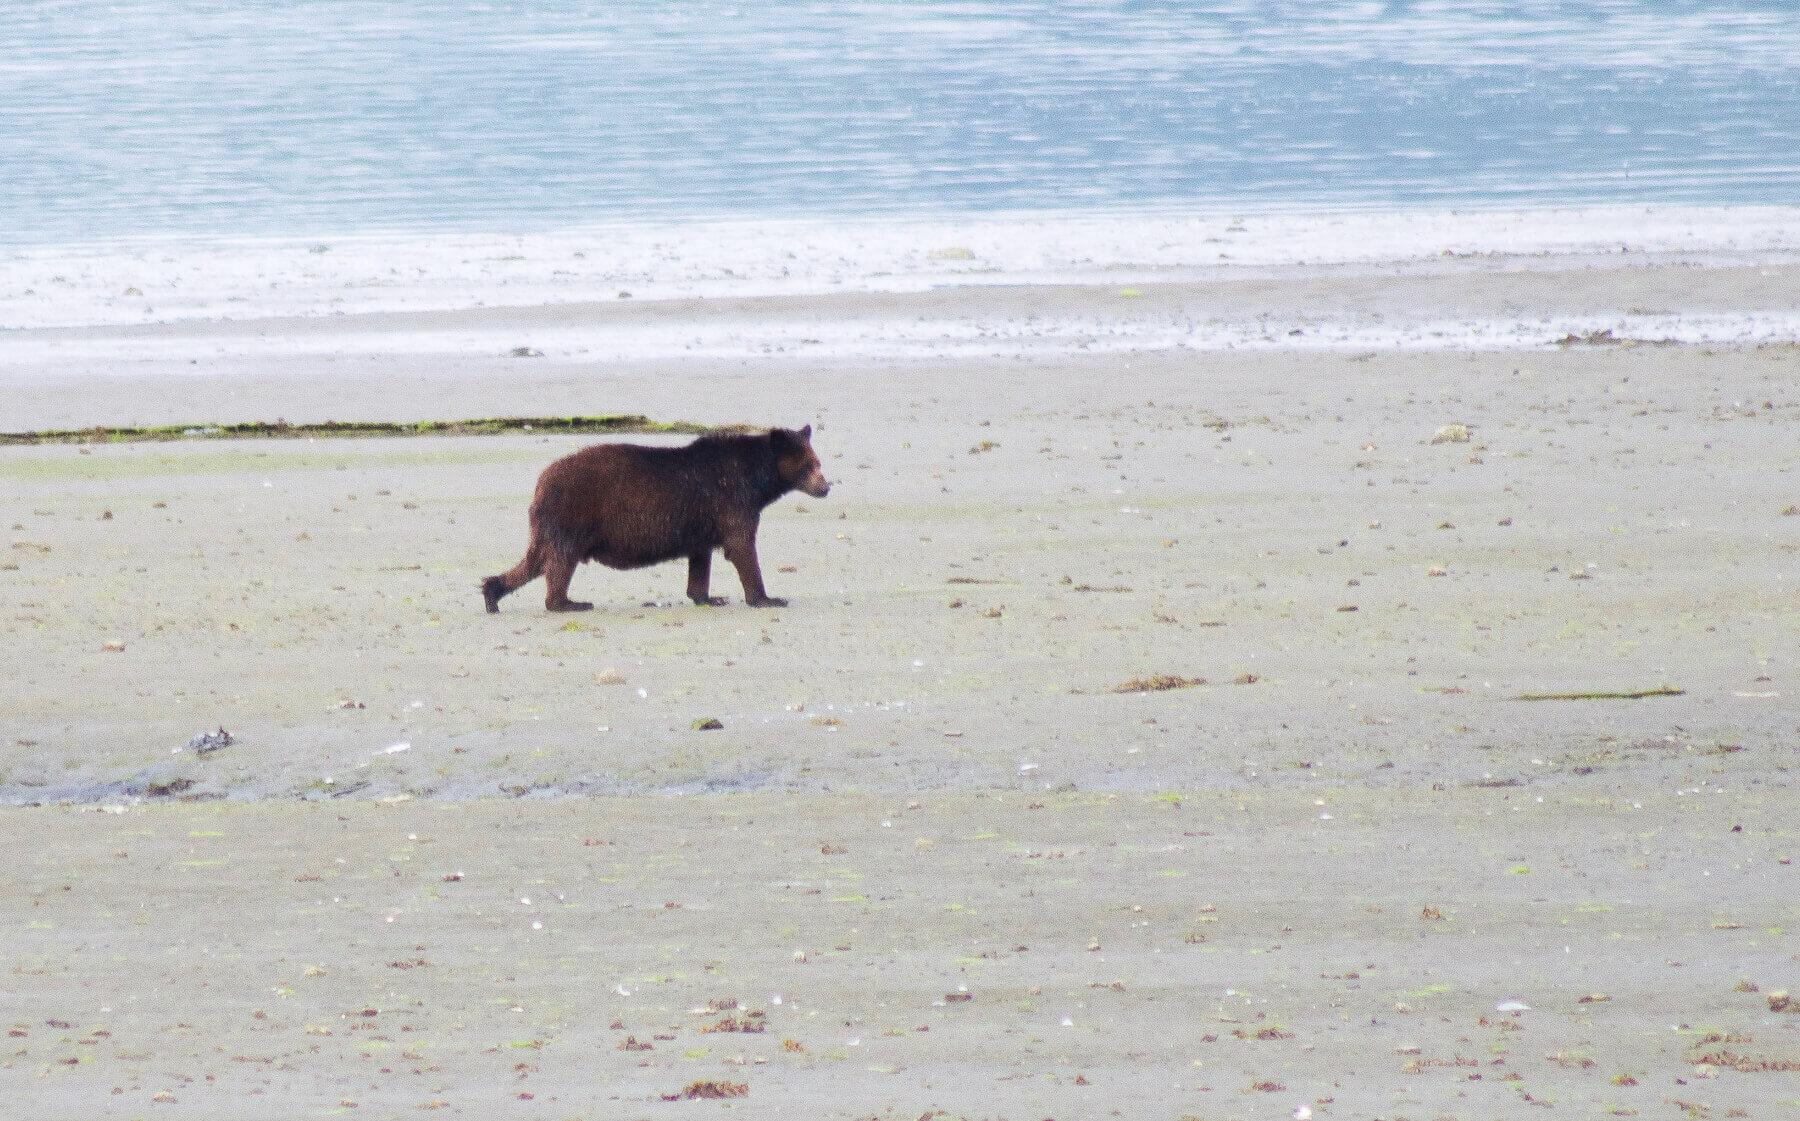 A chubby black bear walking along the beach